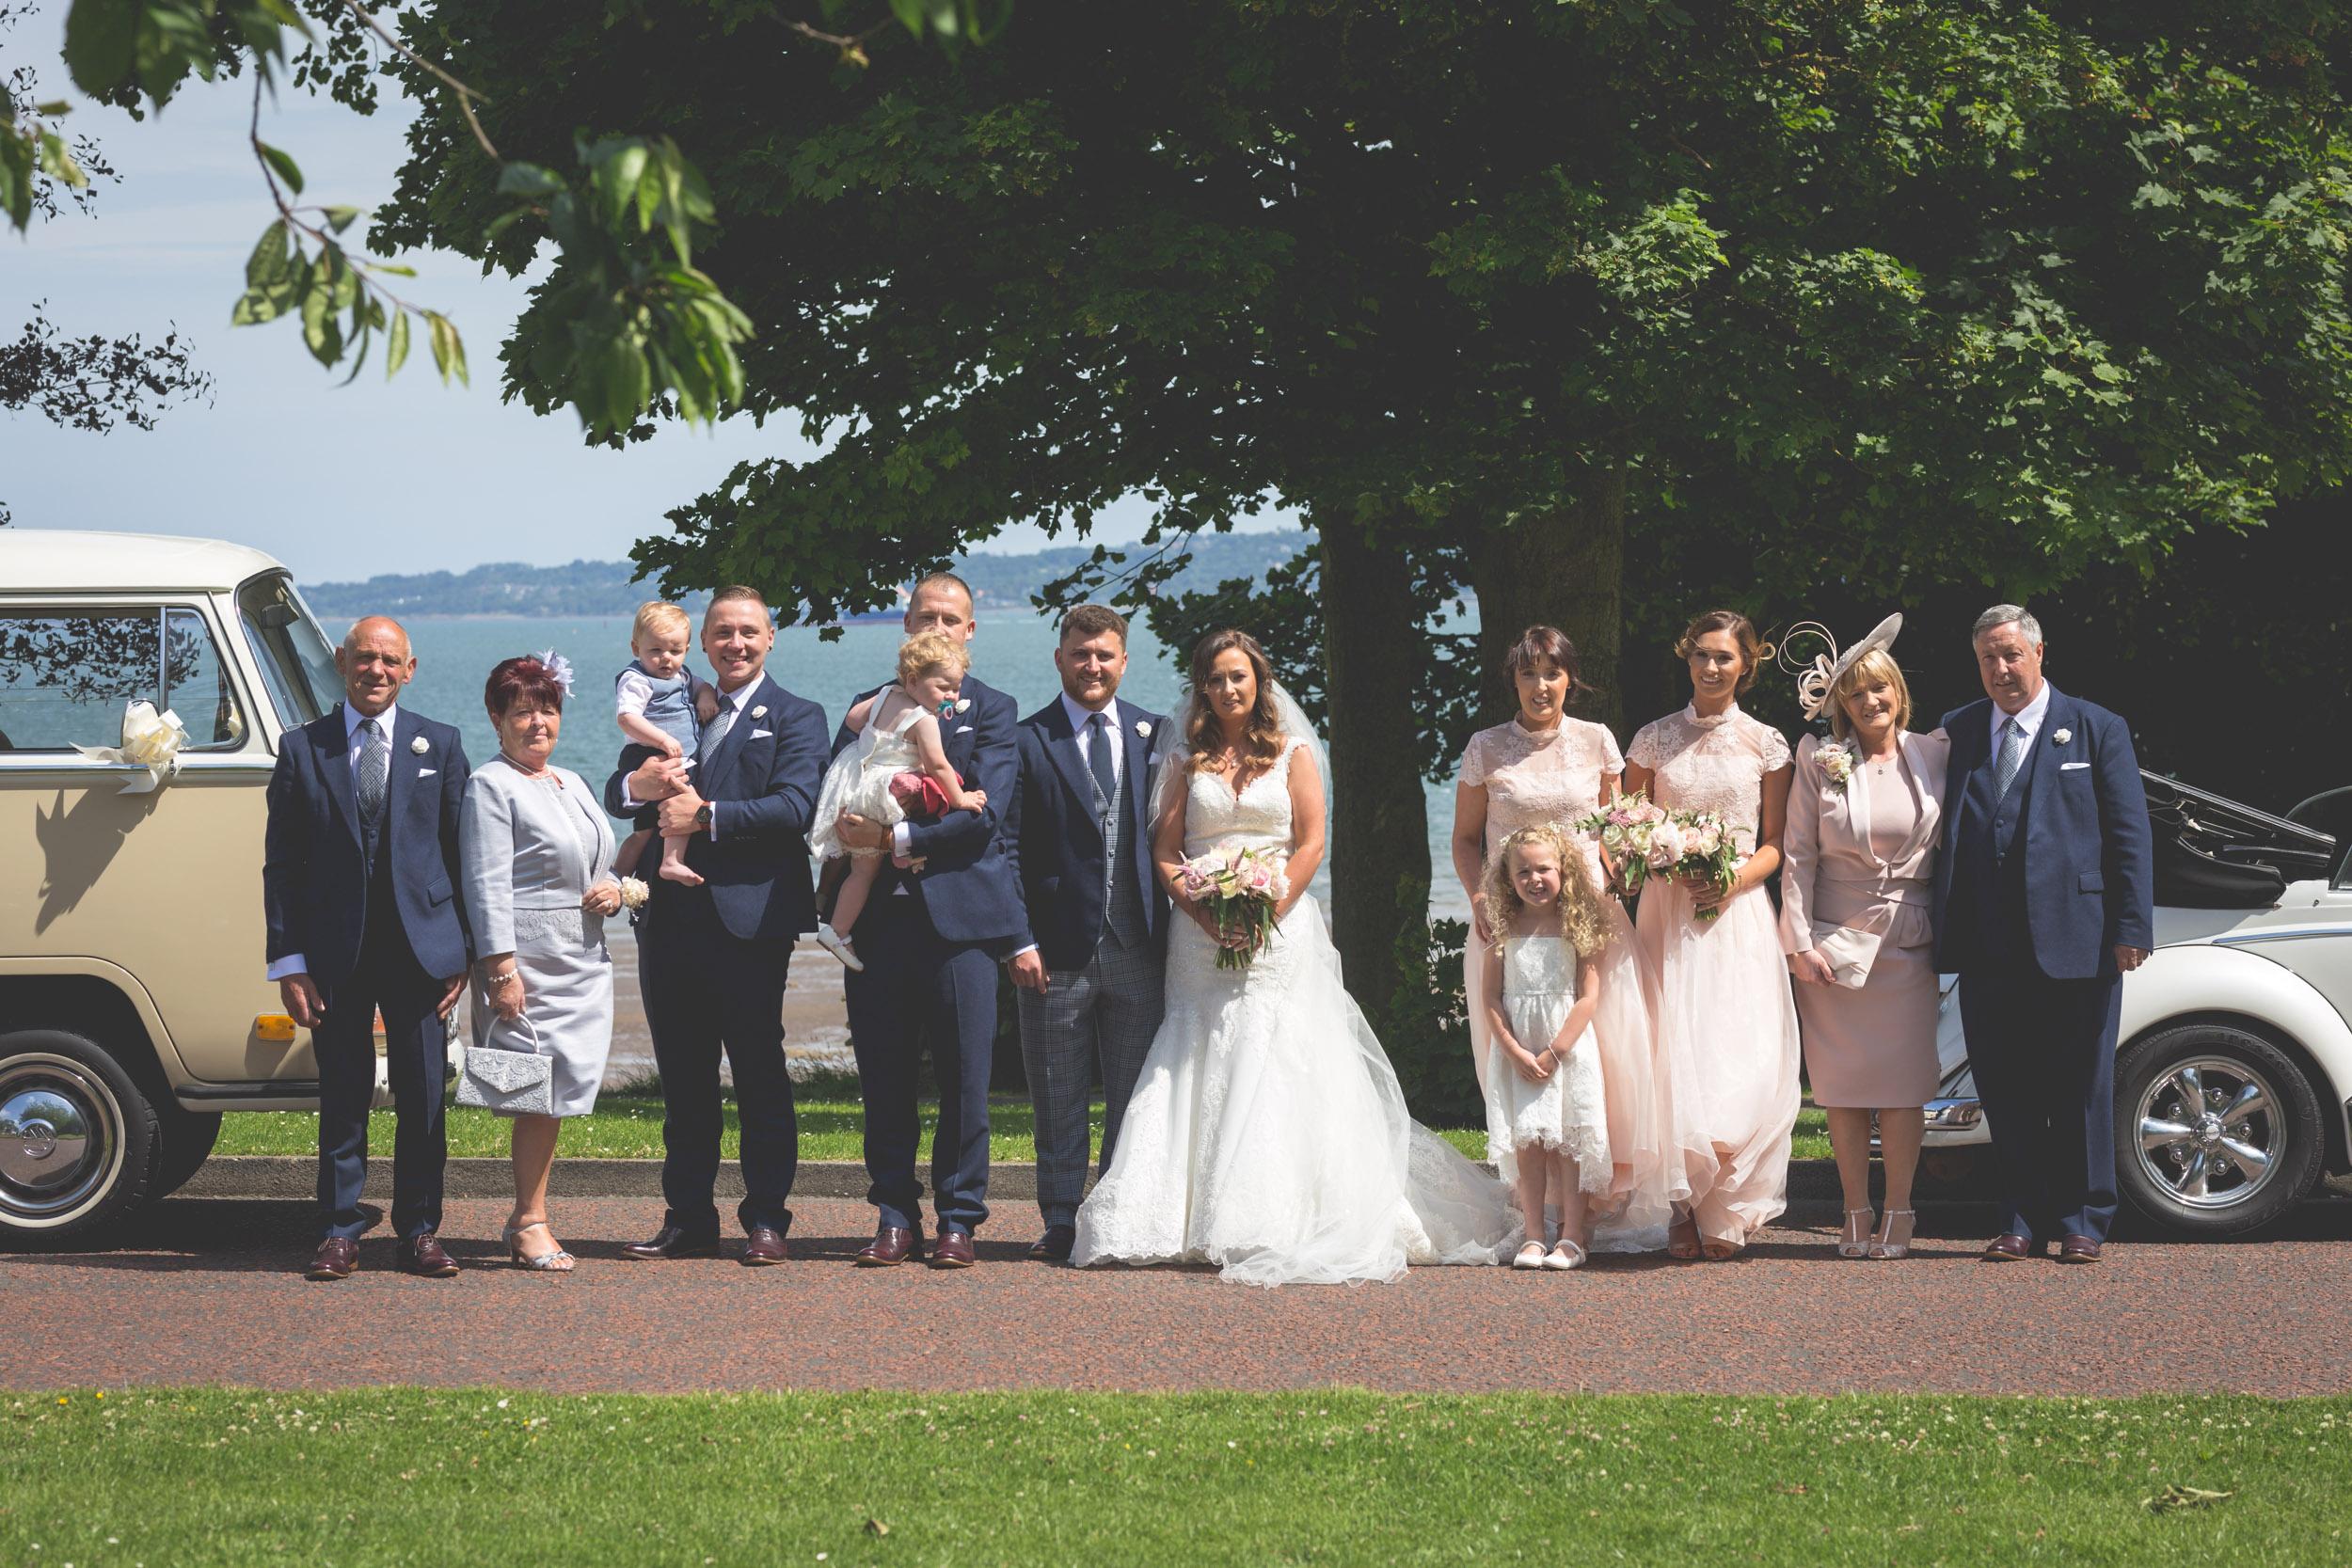 Brian McEwan   Northern Ireland Wedding Photographer   Rebecca & Michael   Portraits-6.jpg